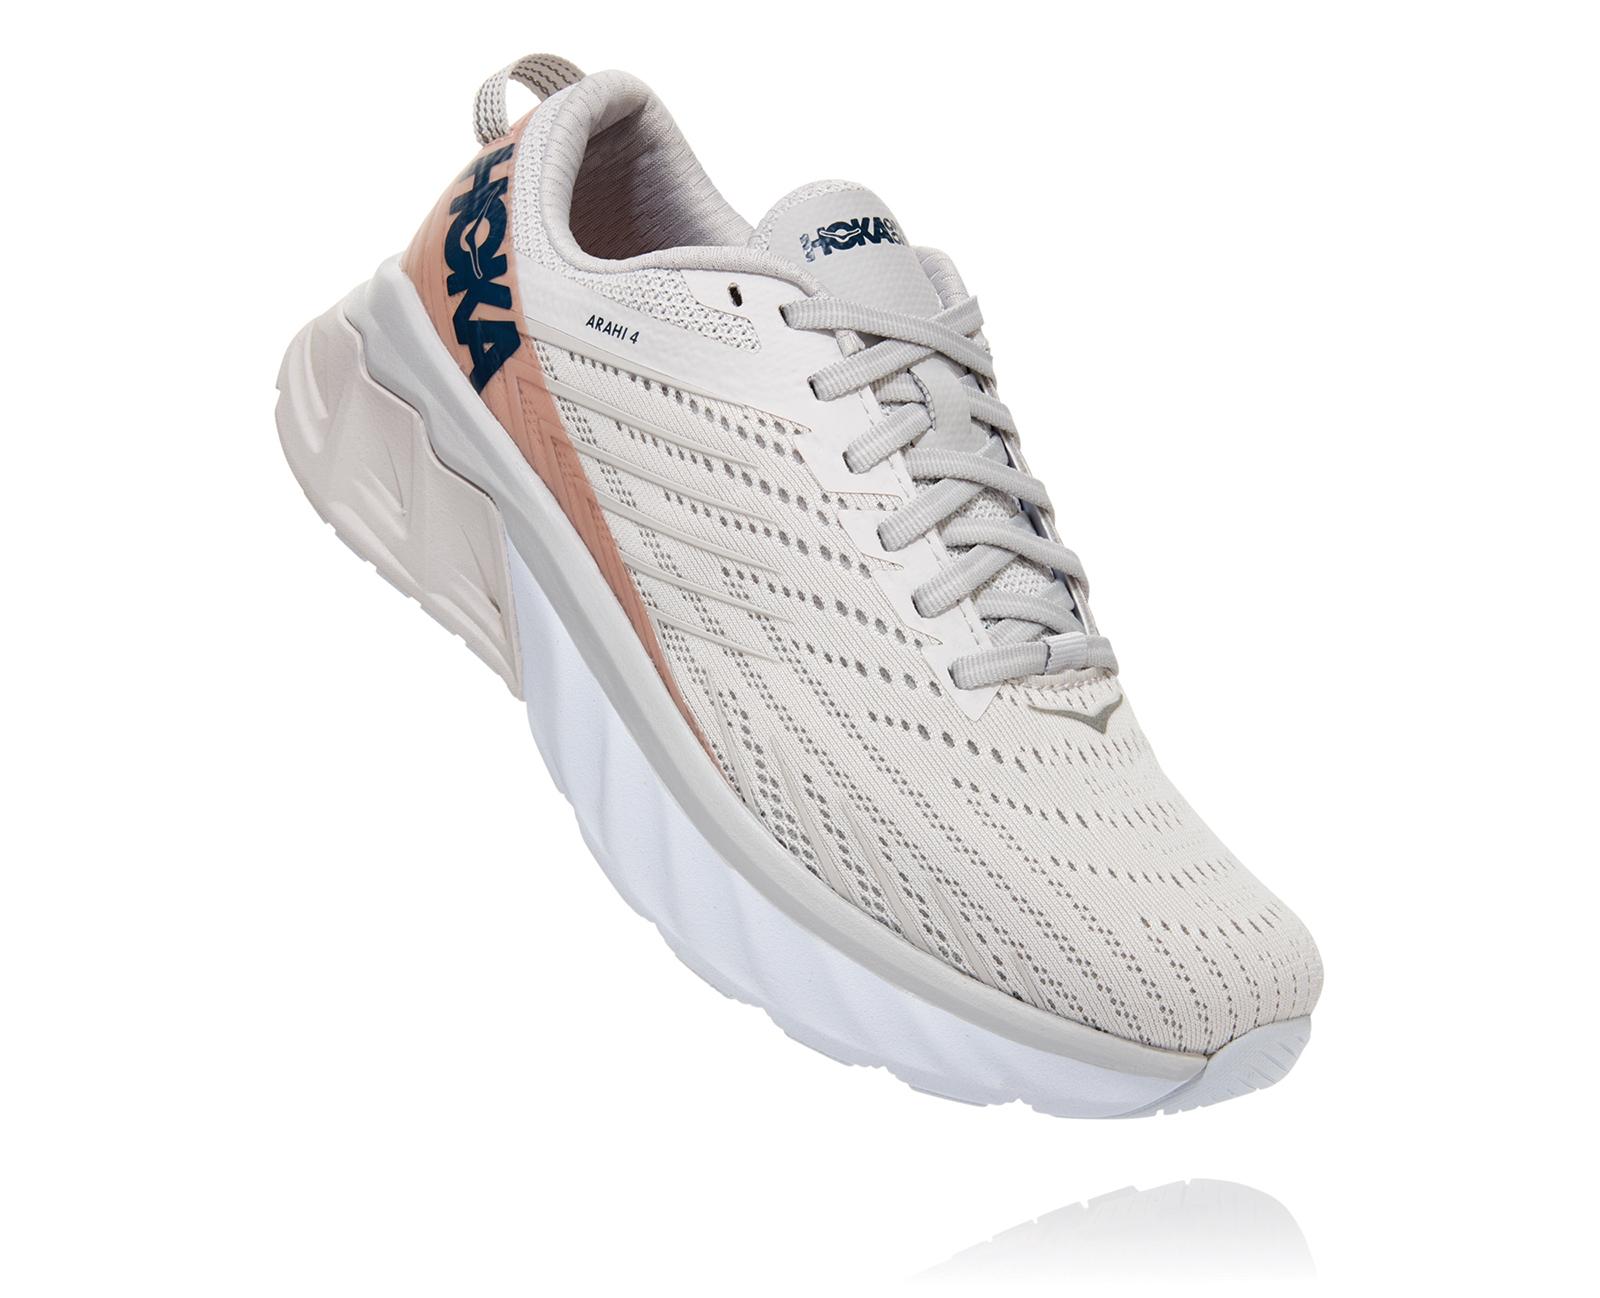 Women's Arahi 4 - Hoka One One Athletic Shoes-Hoka One One